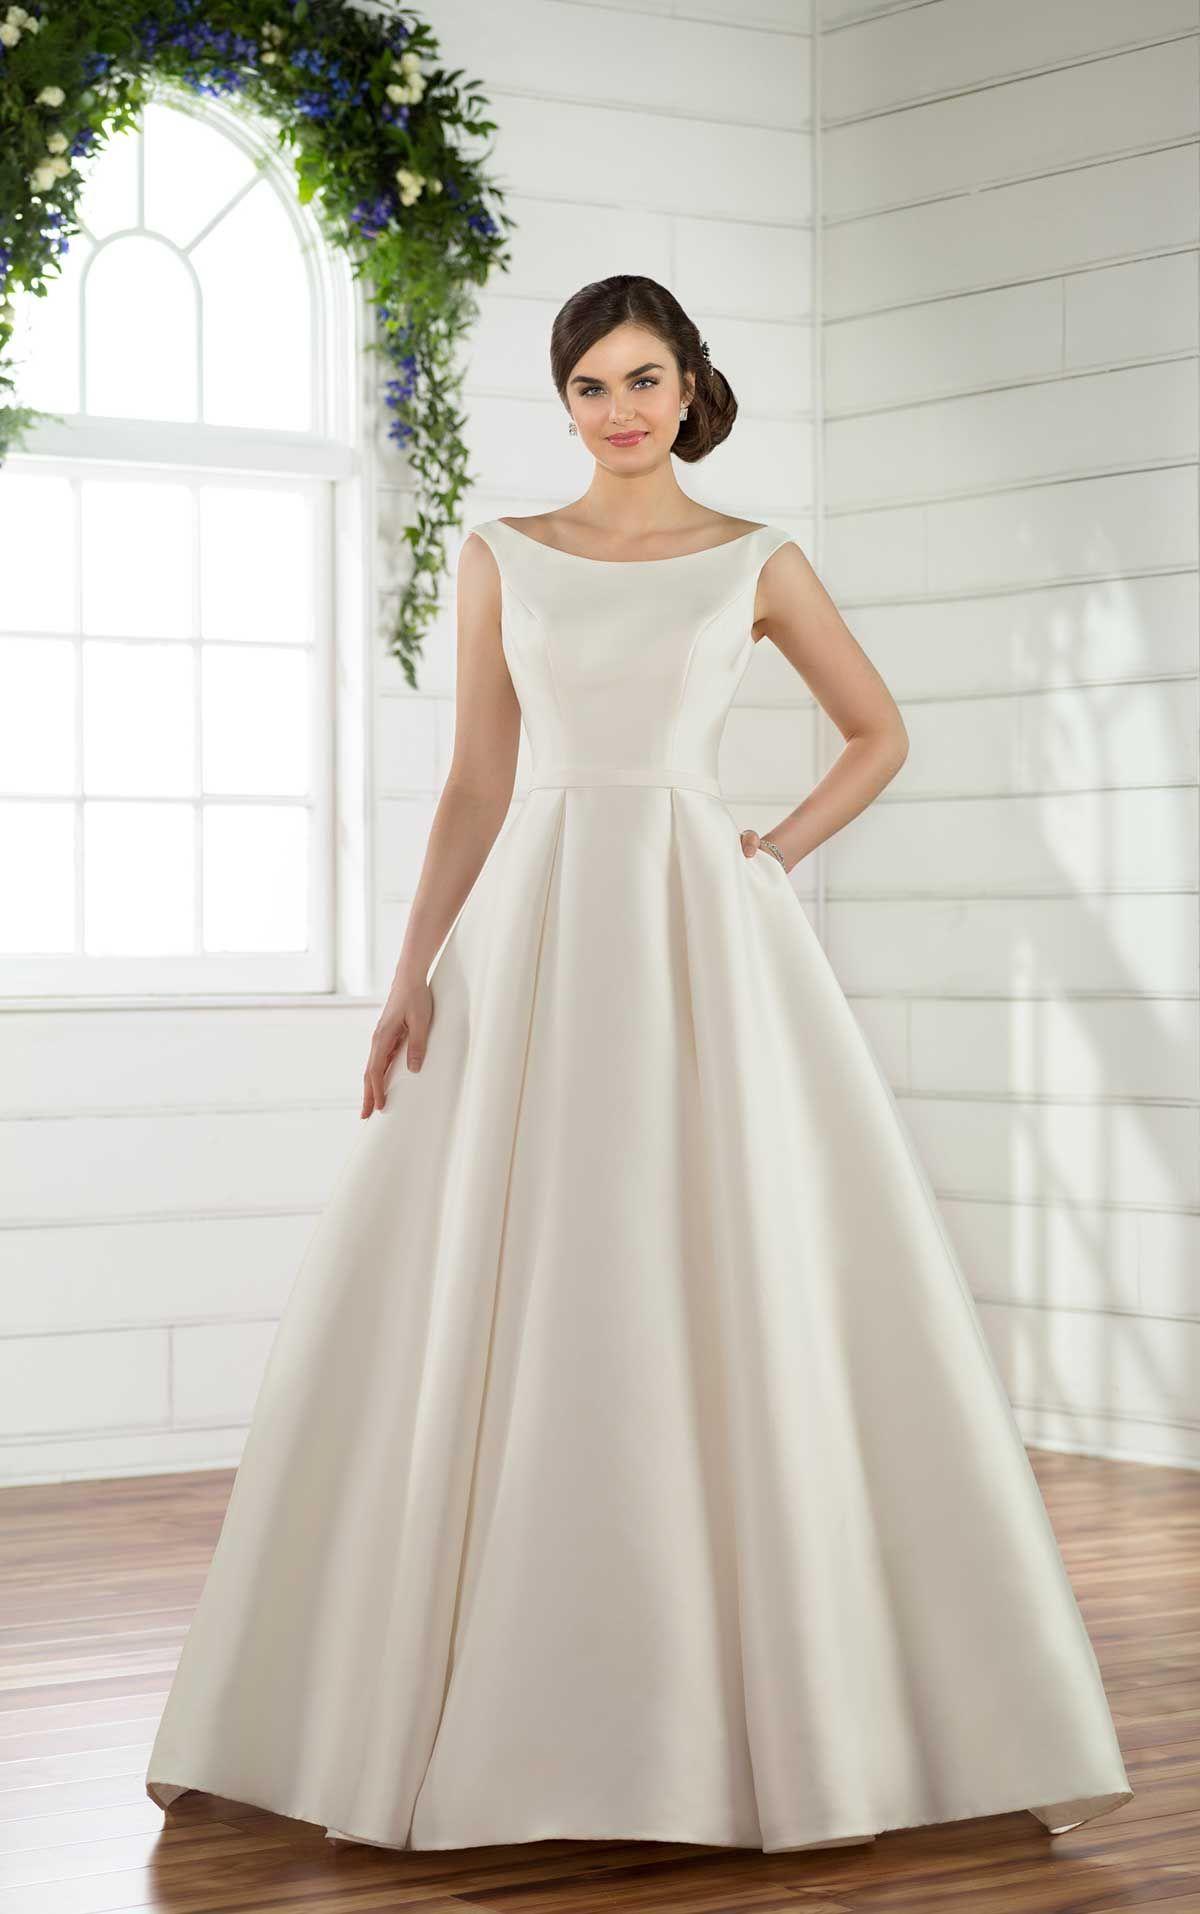 Short And Sweet Wedding Dress Essense Of Australia Wedding Dresses Sweet Wedding Dresses Short Lace Wedding Dress [ 1799 x 1128 Pixel ]